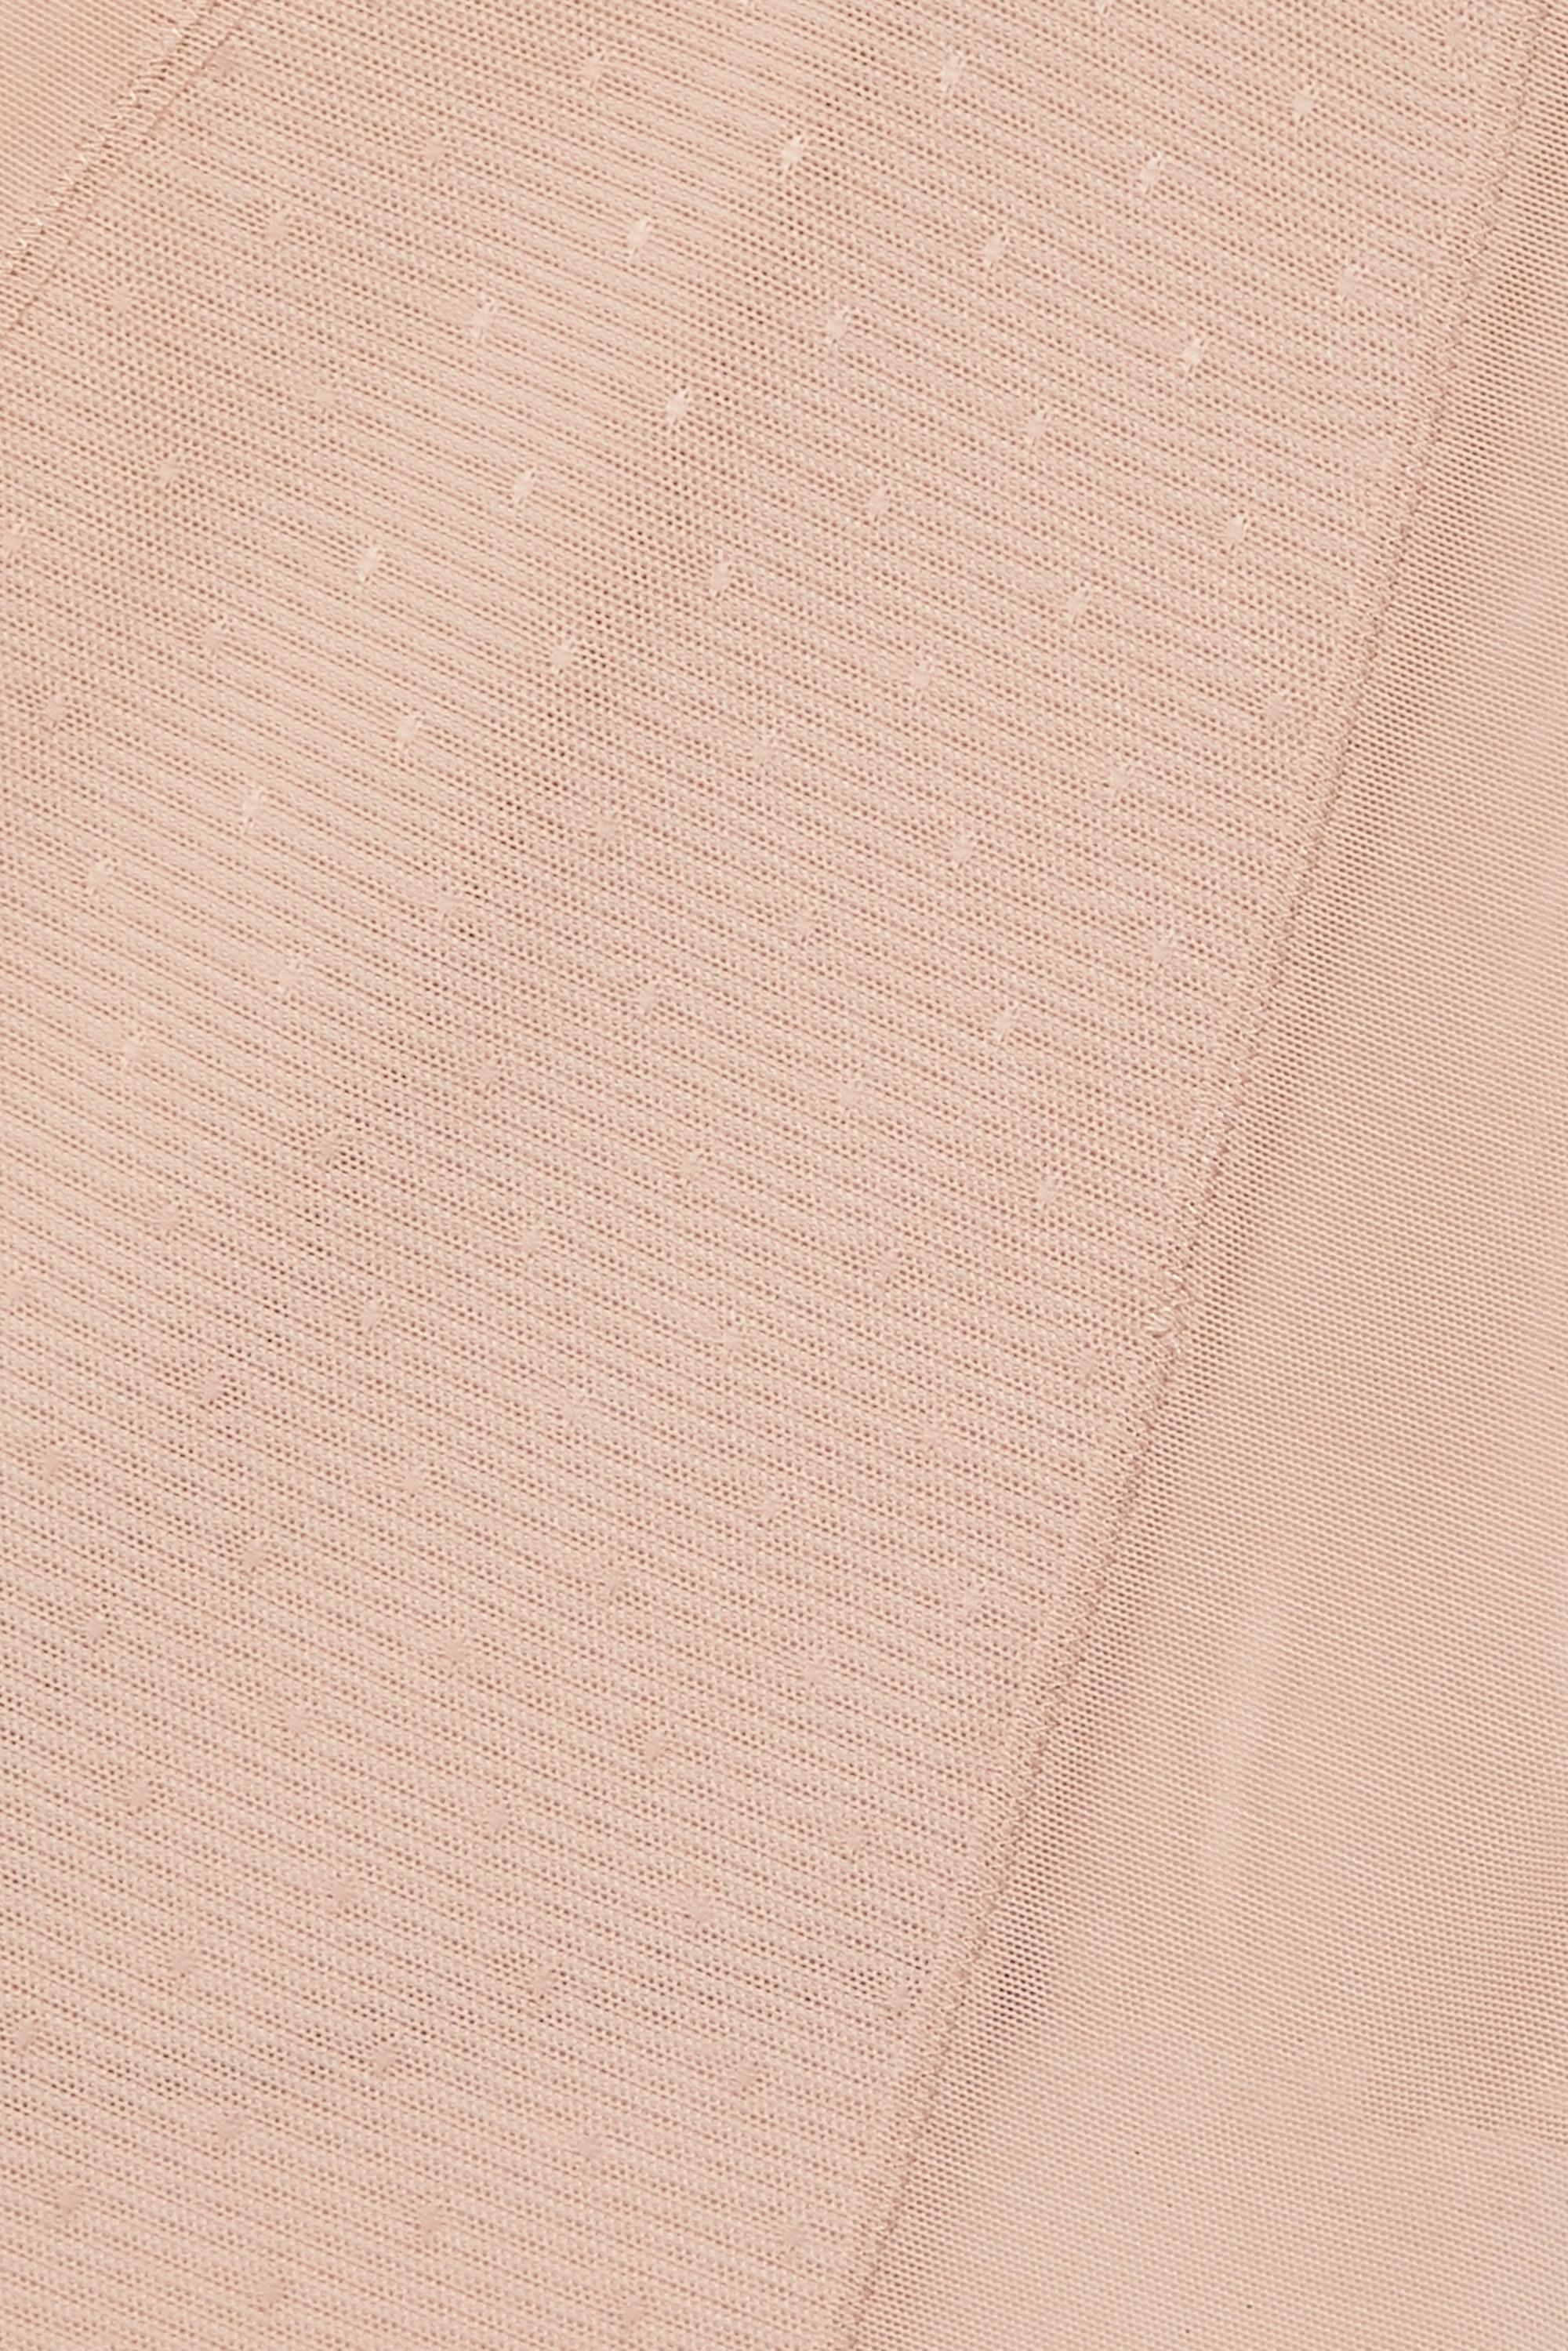 Spanx Spotlight lace-trimmed stretch-tulle bodysuit